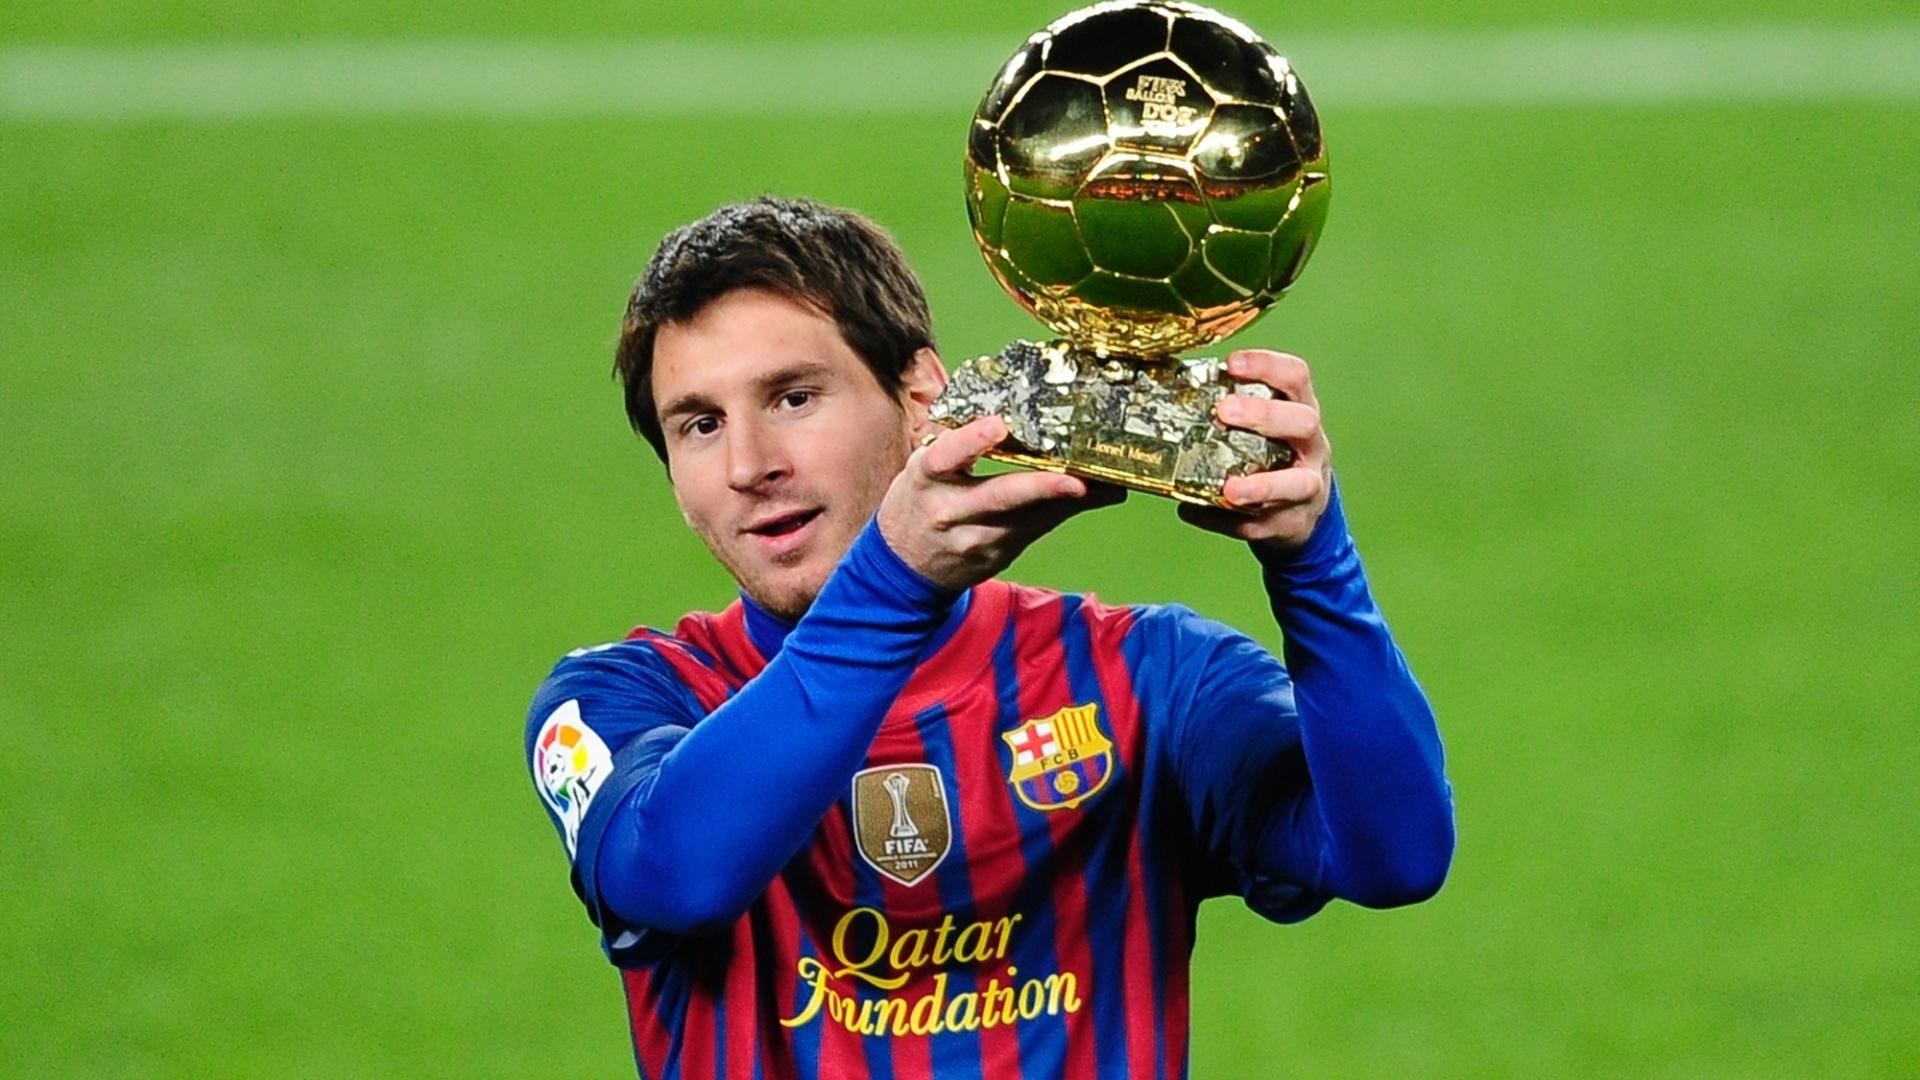 Lionel Messi Best Wallpaper Download 393 Wallpaper Cool Wallpaper 1920x1080